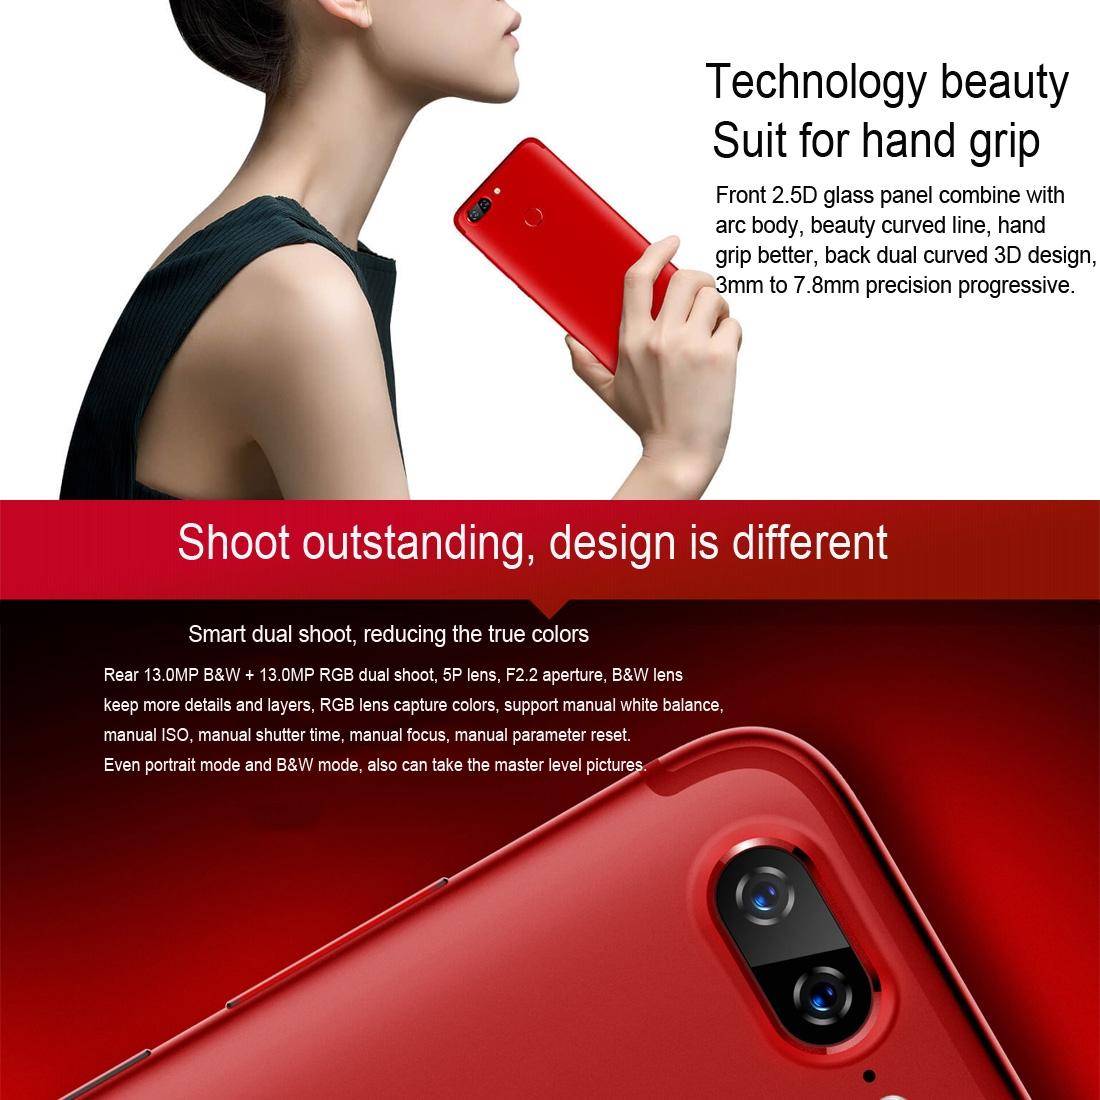 i.ibb.co/RjzQ3GF/Smartphone-Celular-3-GB-RAM-32-GB-ROM-Lenovo-S5-K520-6.jpg